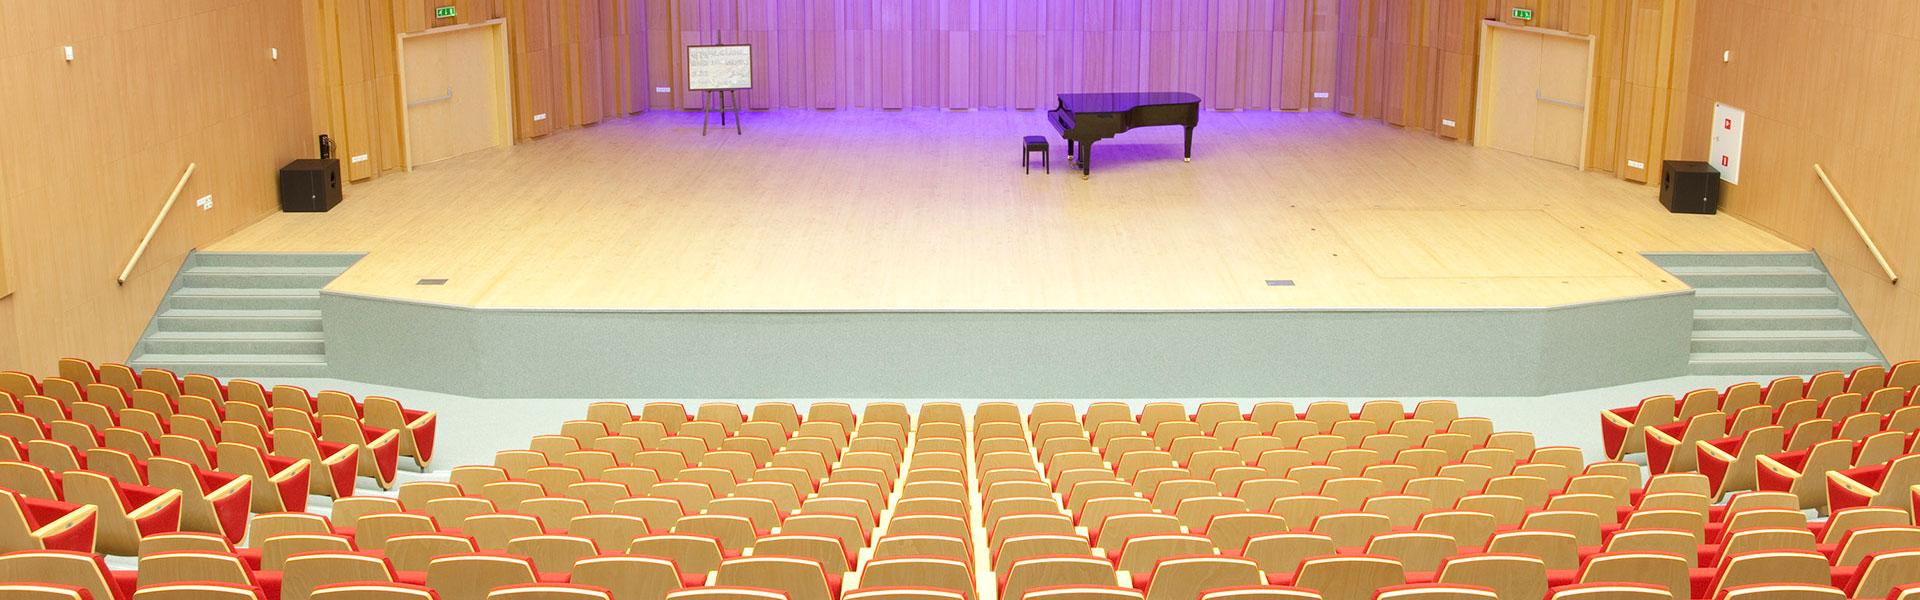 Sekcja Fortepianu